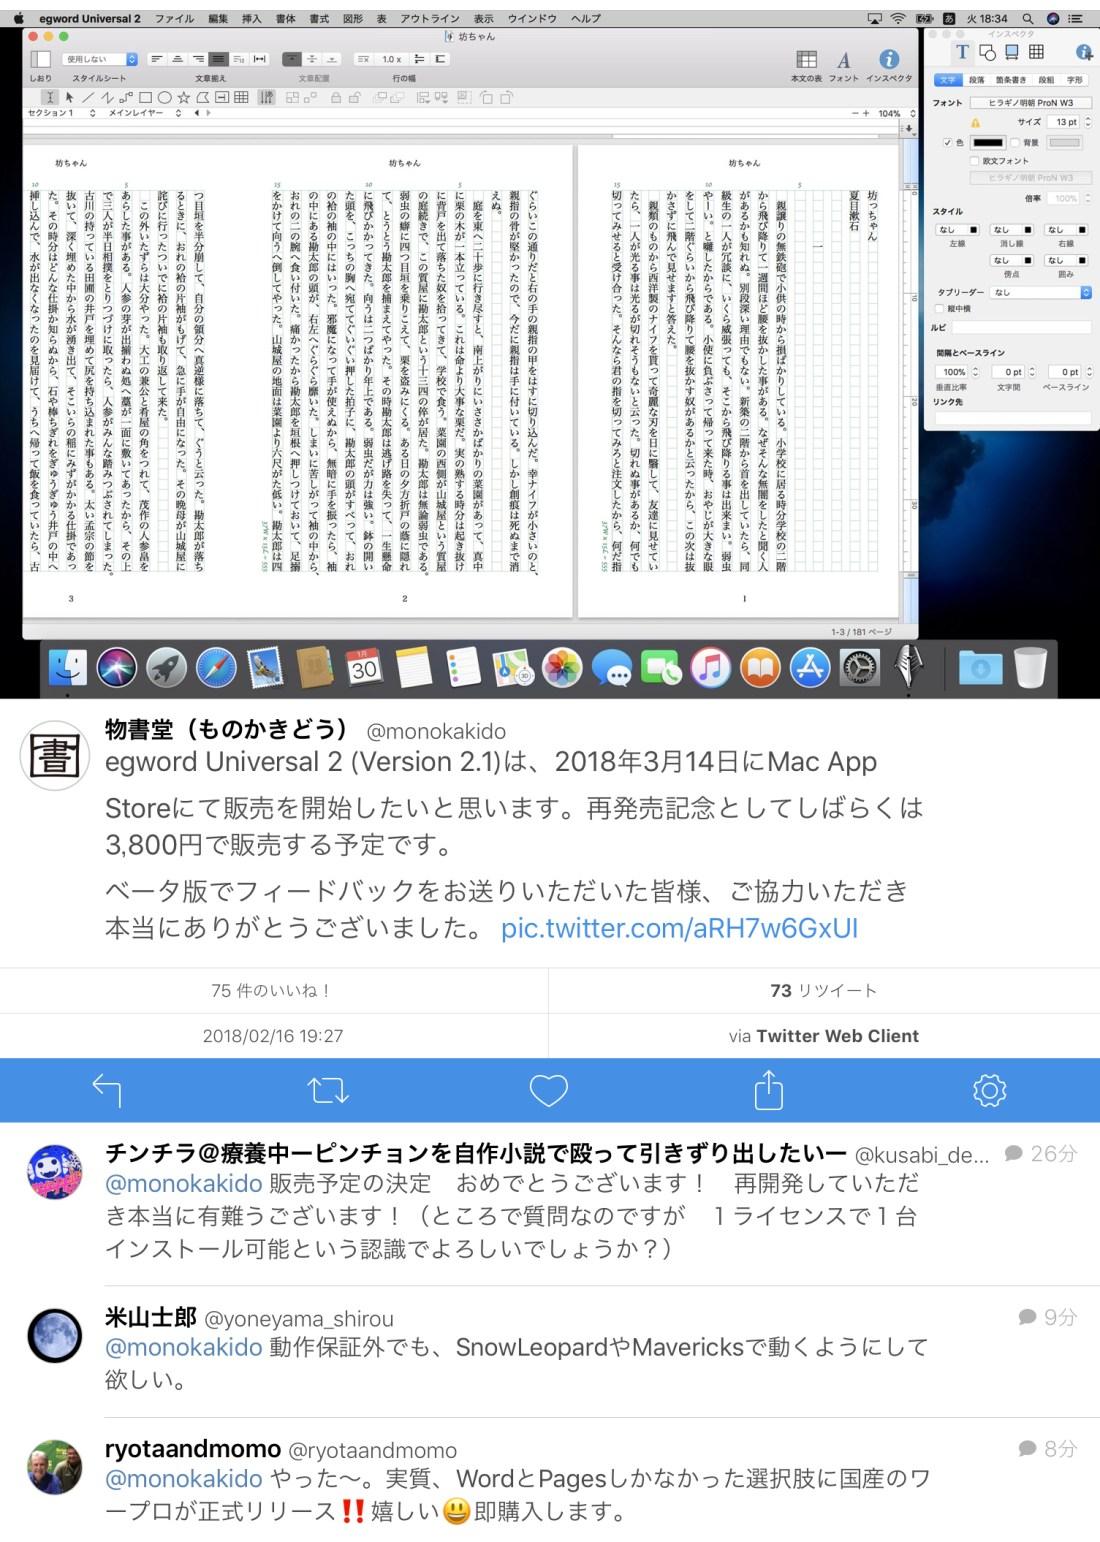 egword Universal 2.1 Announcement